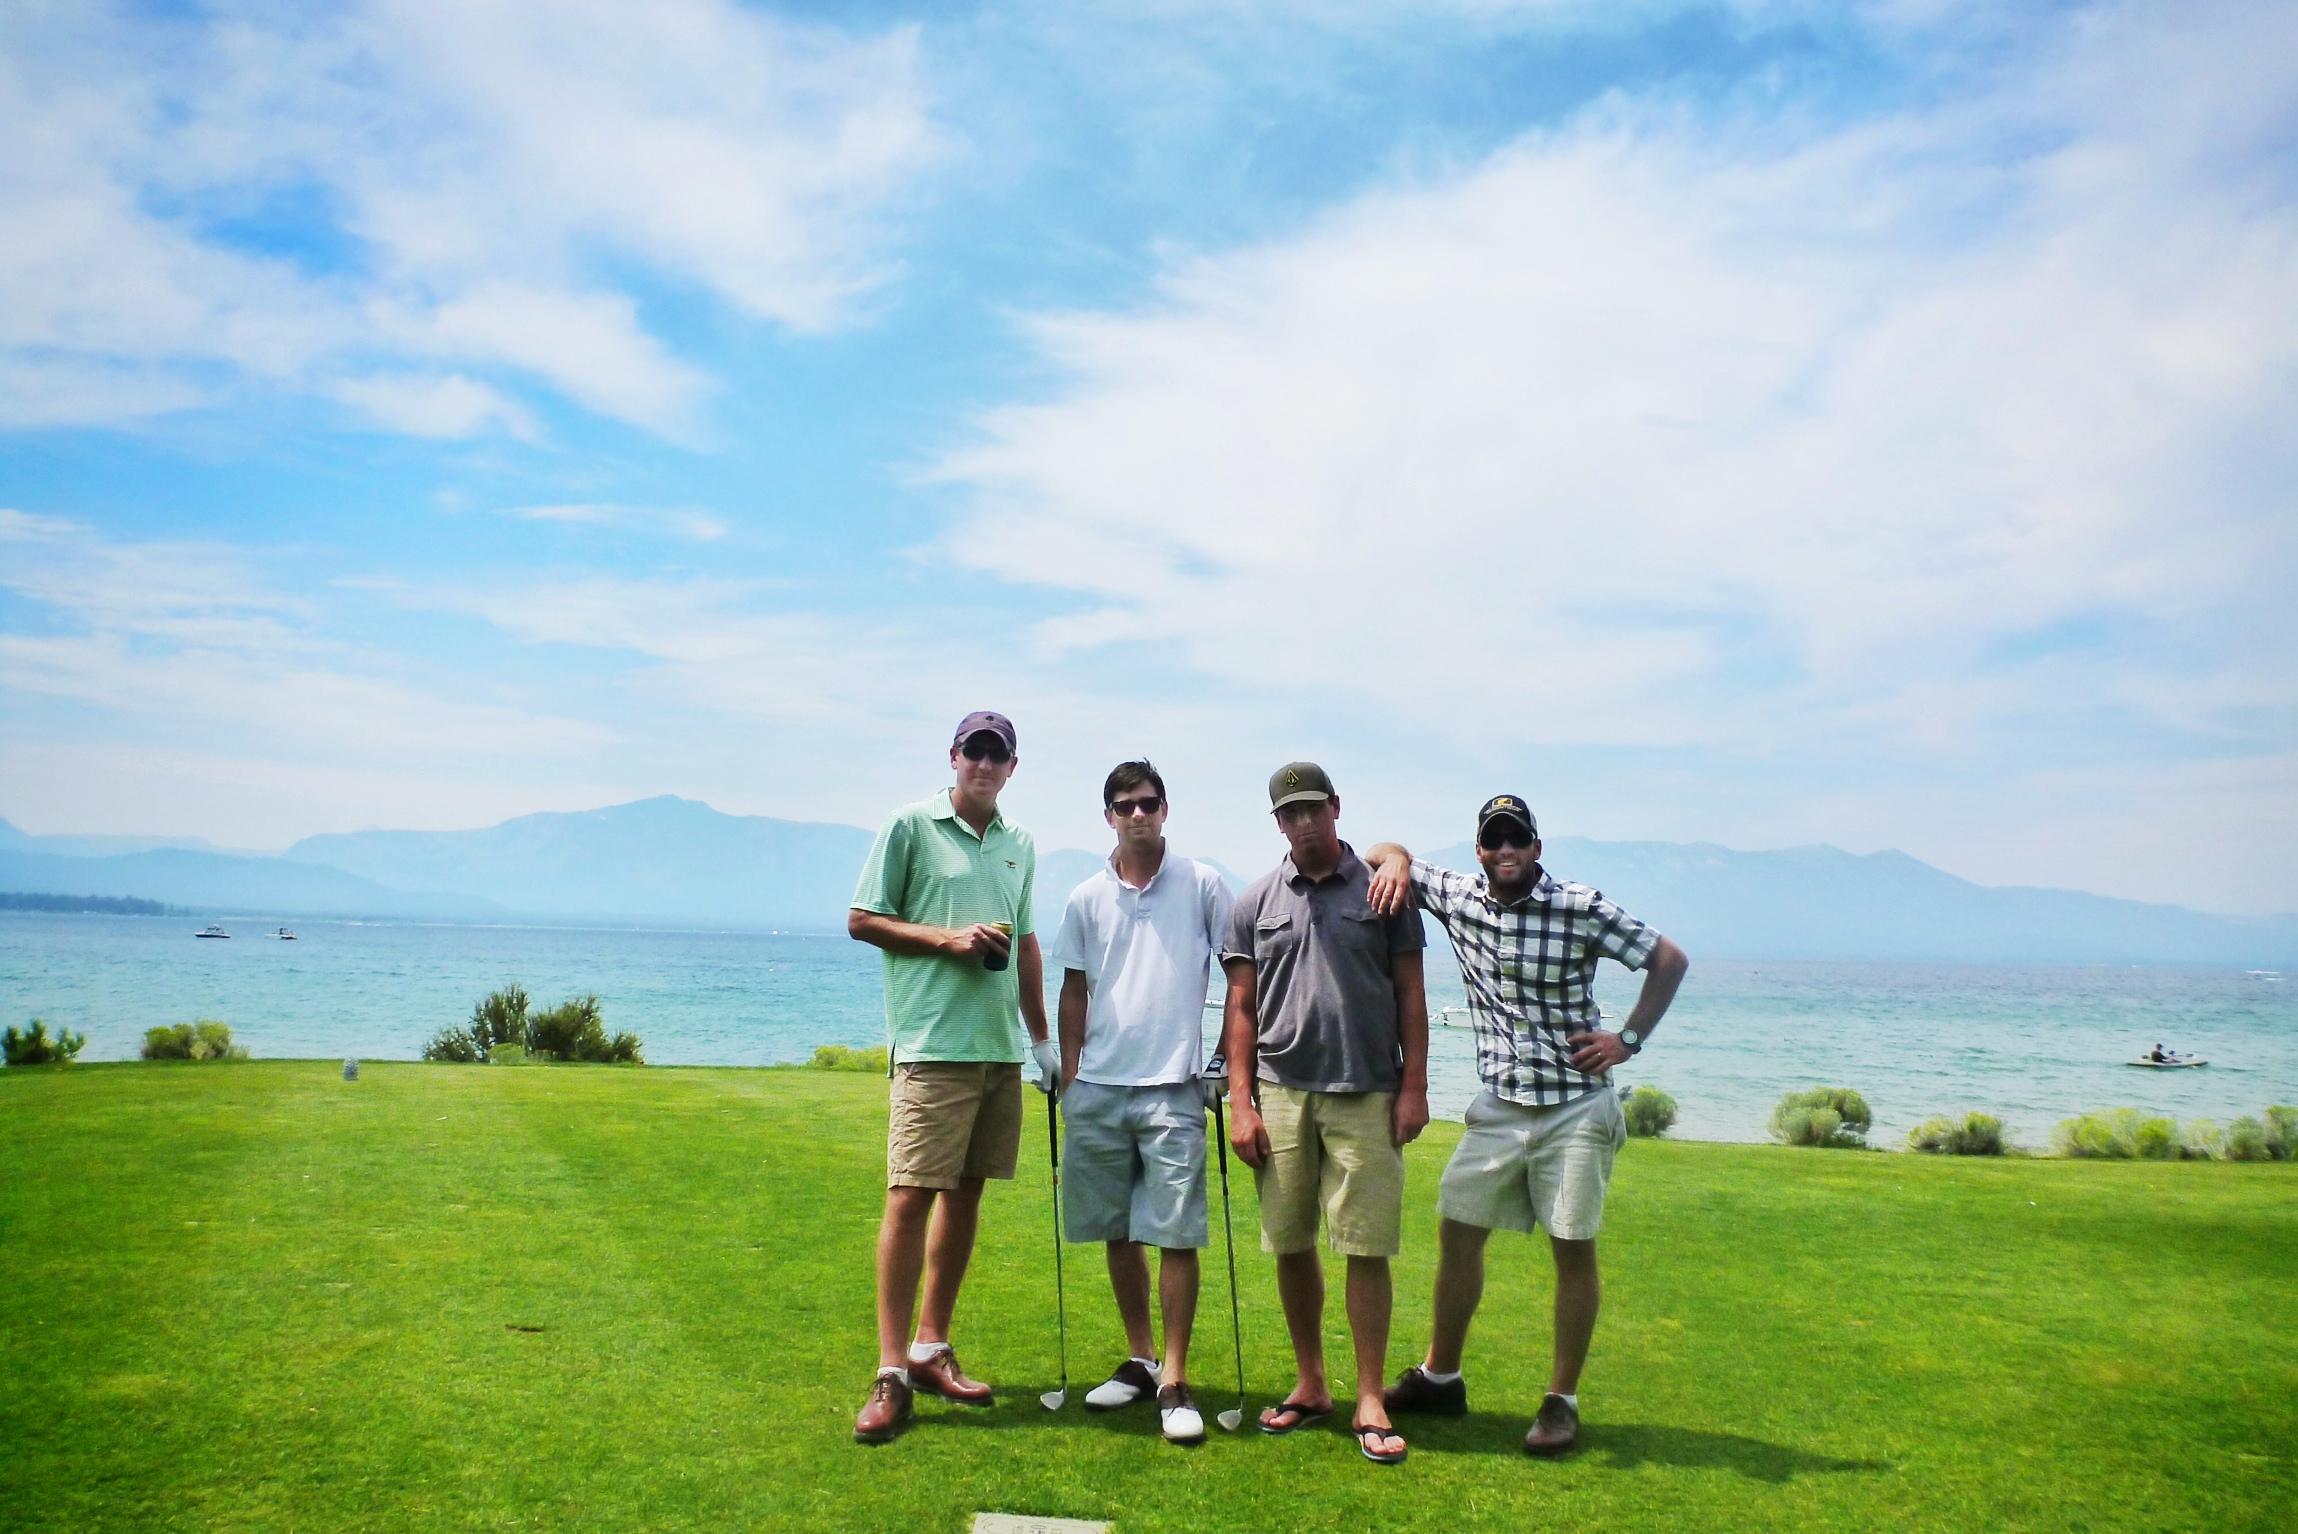 South Lake Tahoe, Edgewood Golf